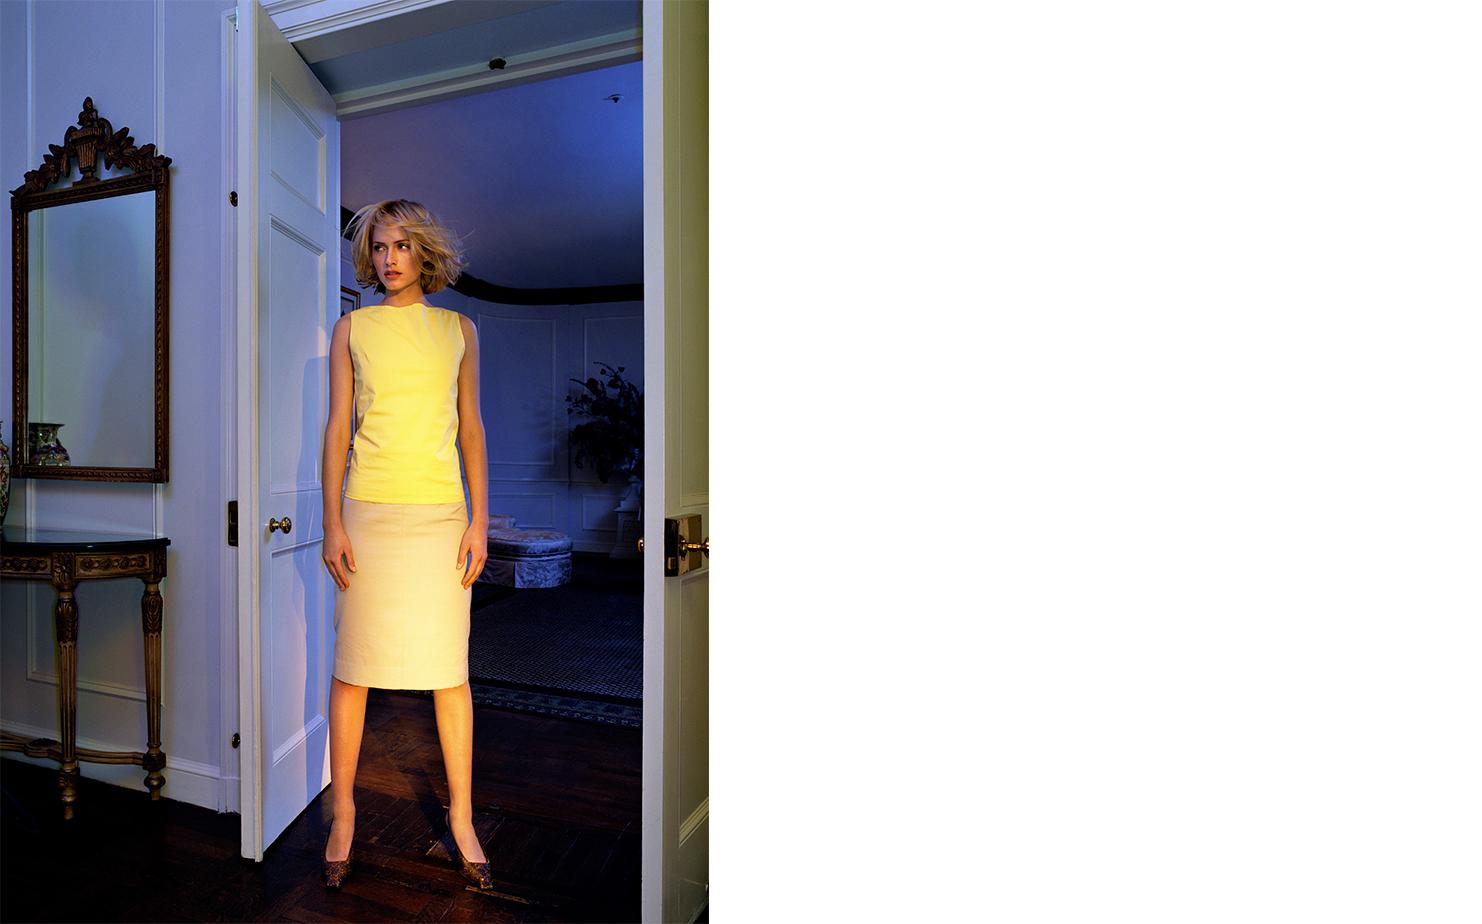 Harper's Bazaar   A VERY STYLISH GIRL   FASHION EDITOR Elissa Santisi MODEL Amber Valletta